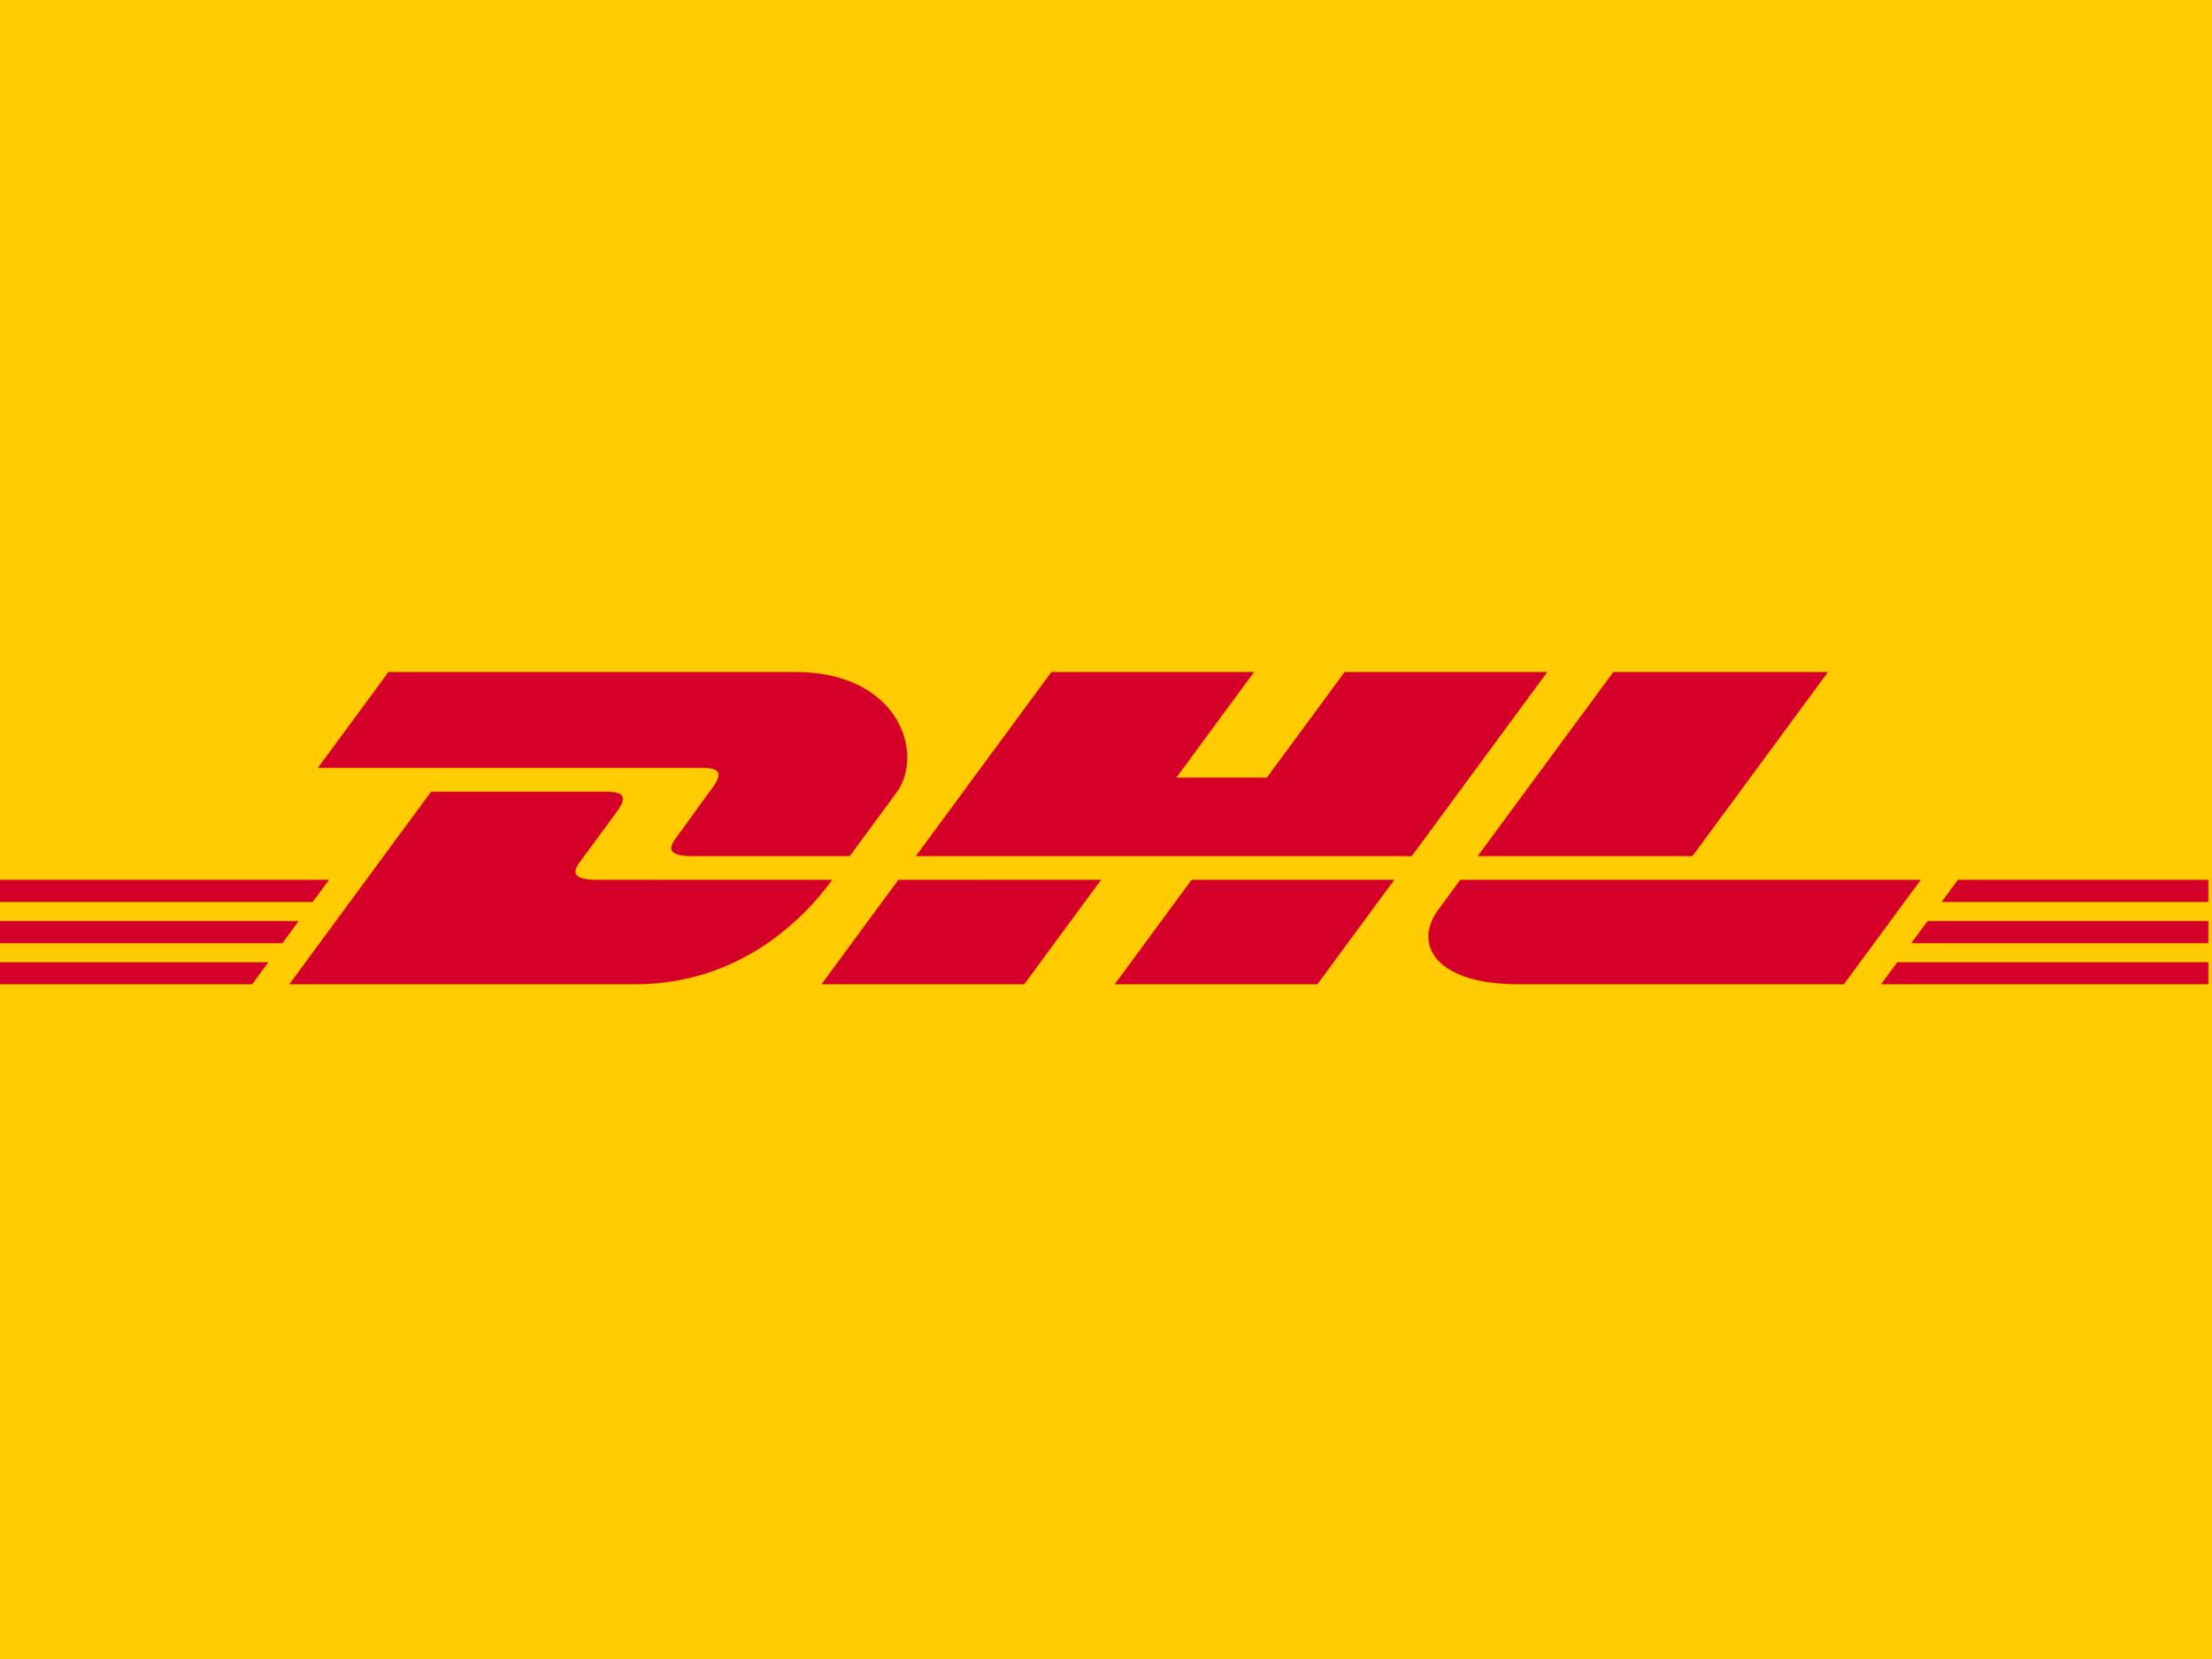 Page365-บริษัทขนส่ง-DHL EXPRESS.png